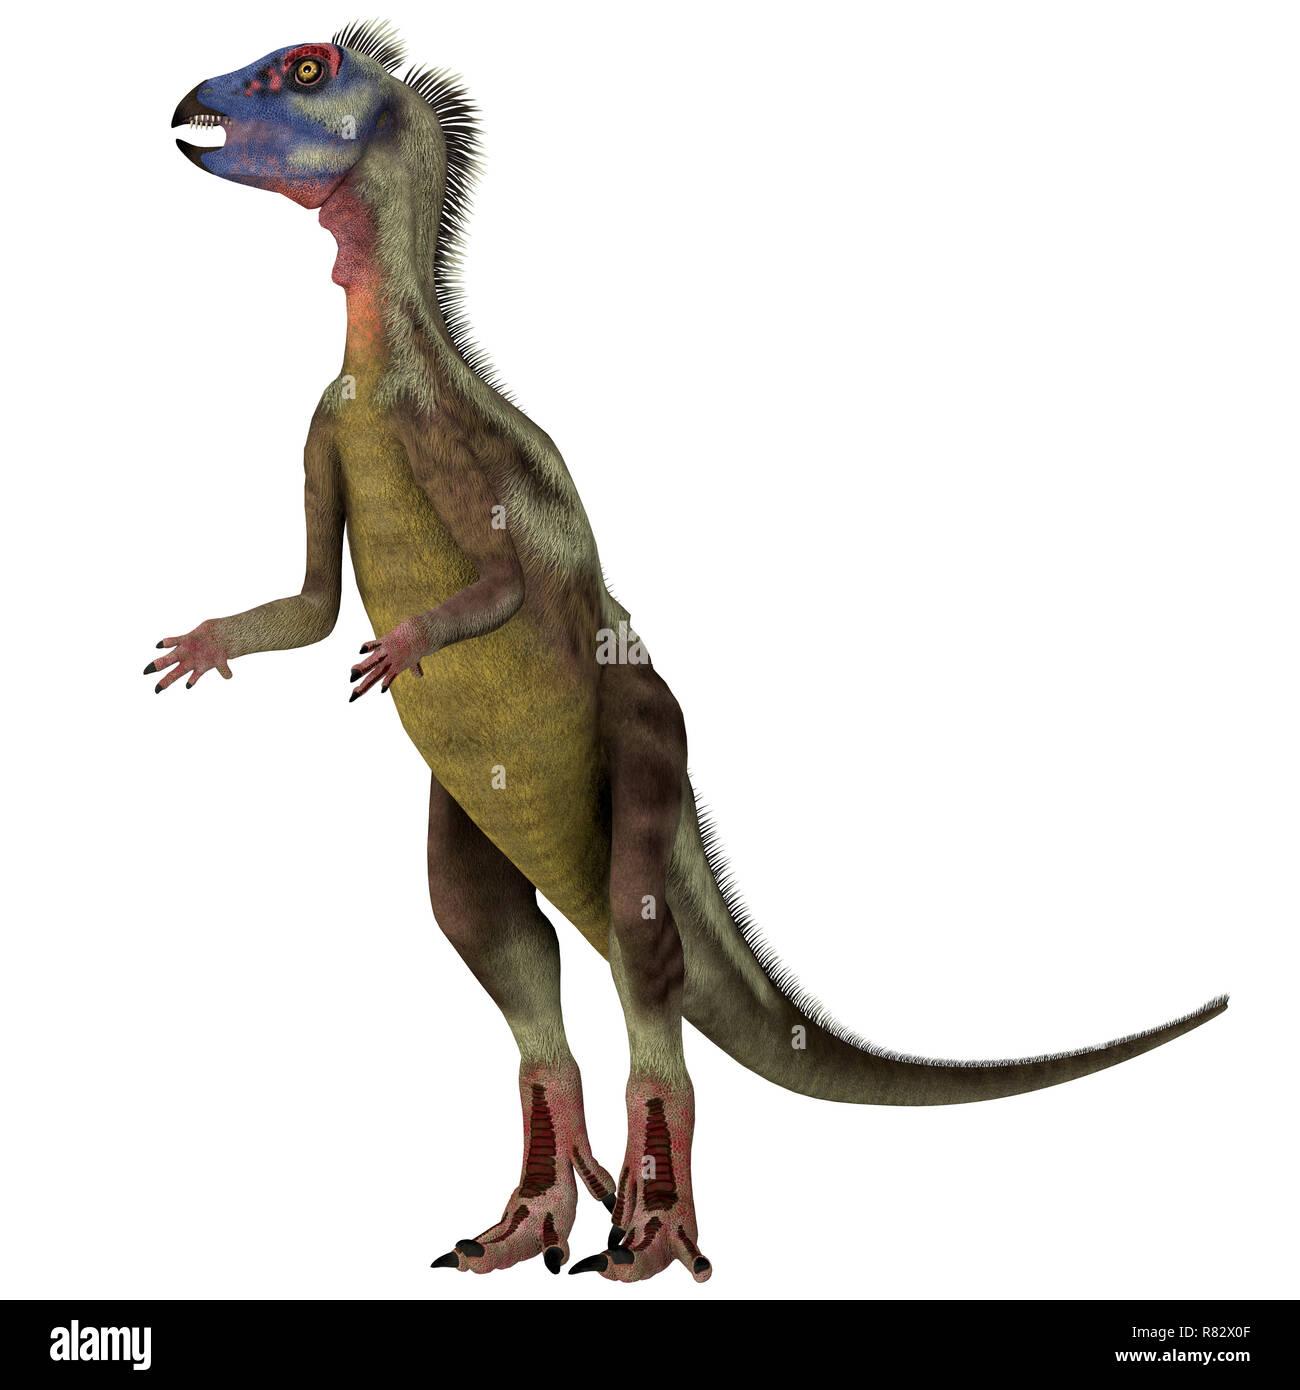 Hypsilophodon Dinosaur on White - Hypsilophodon was a omnivorous ornithopod dinosaur that lived in England during the Cretaceous Period. - Stock Image